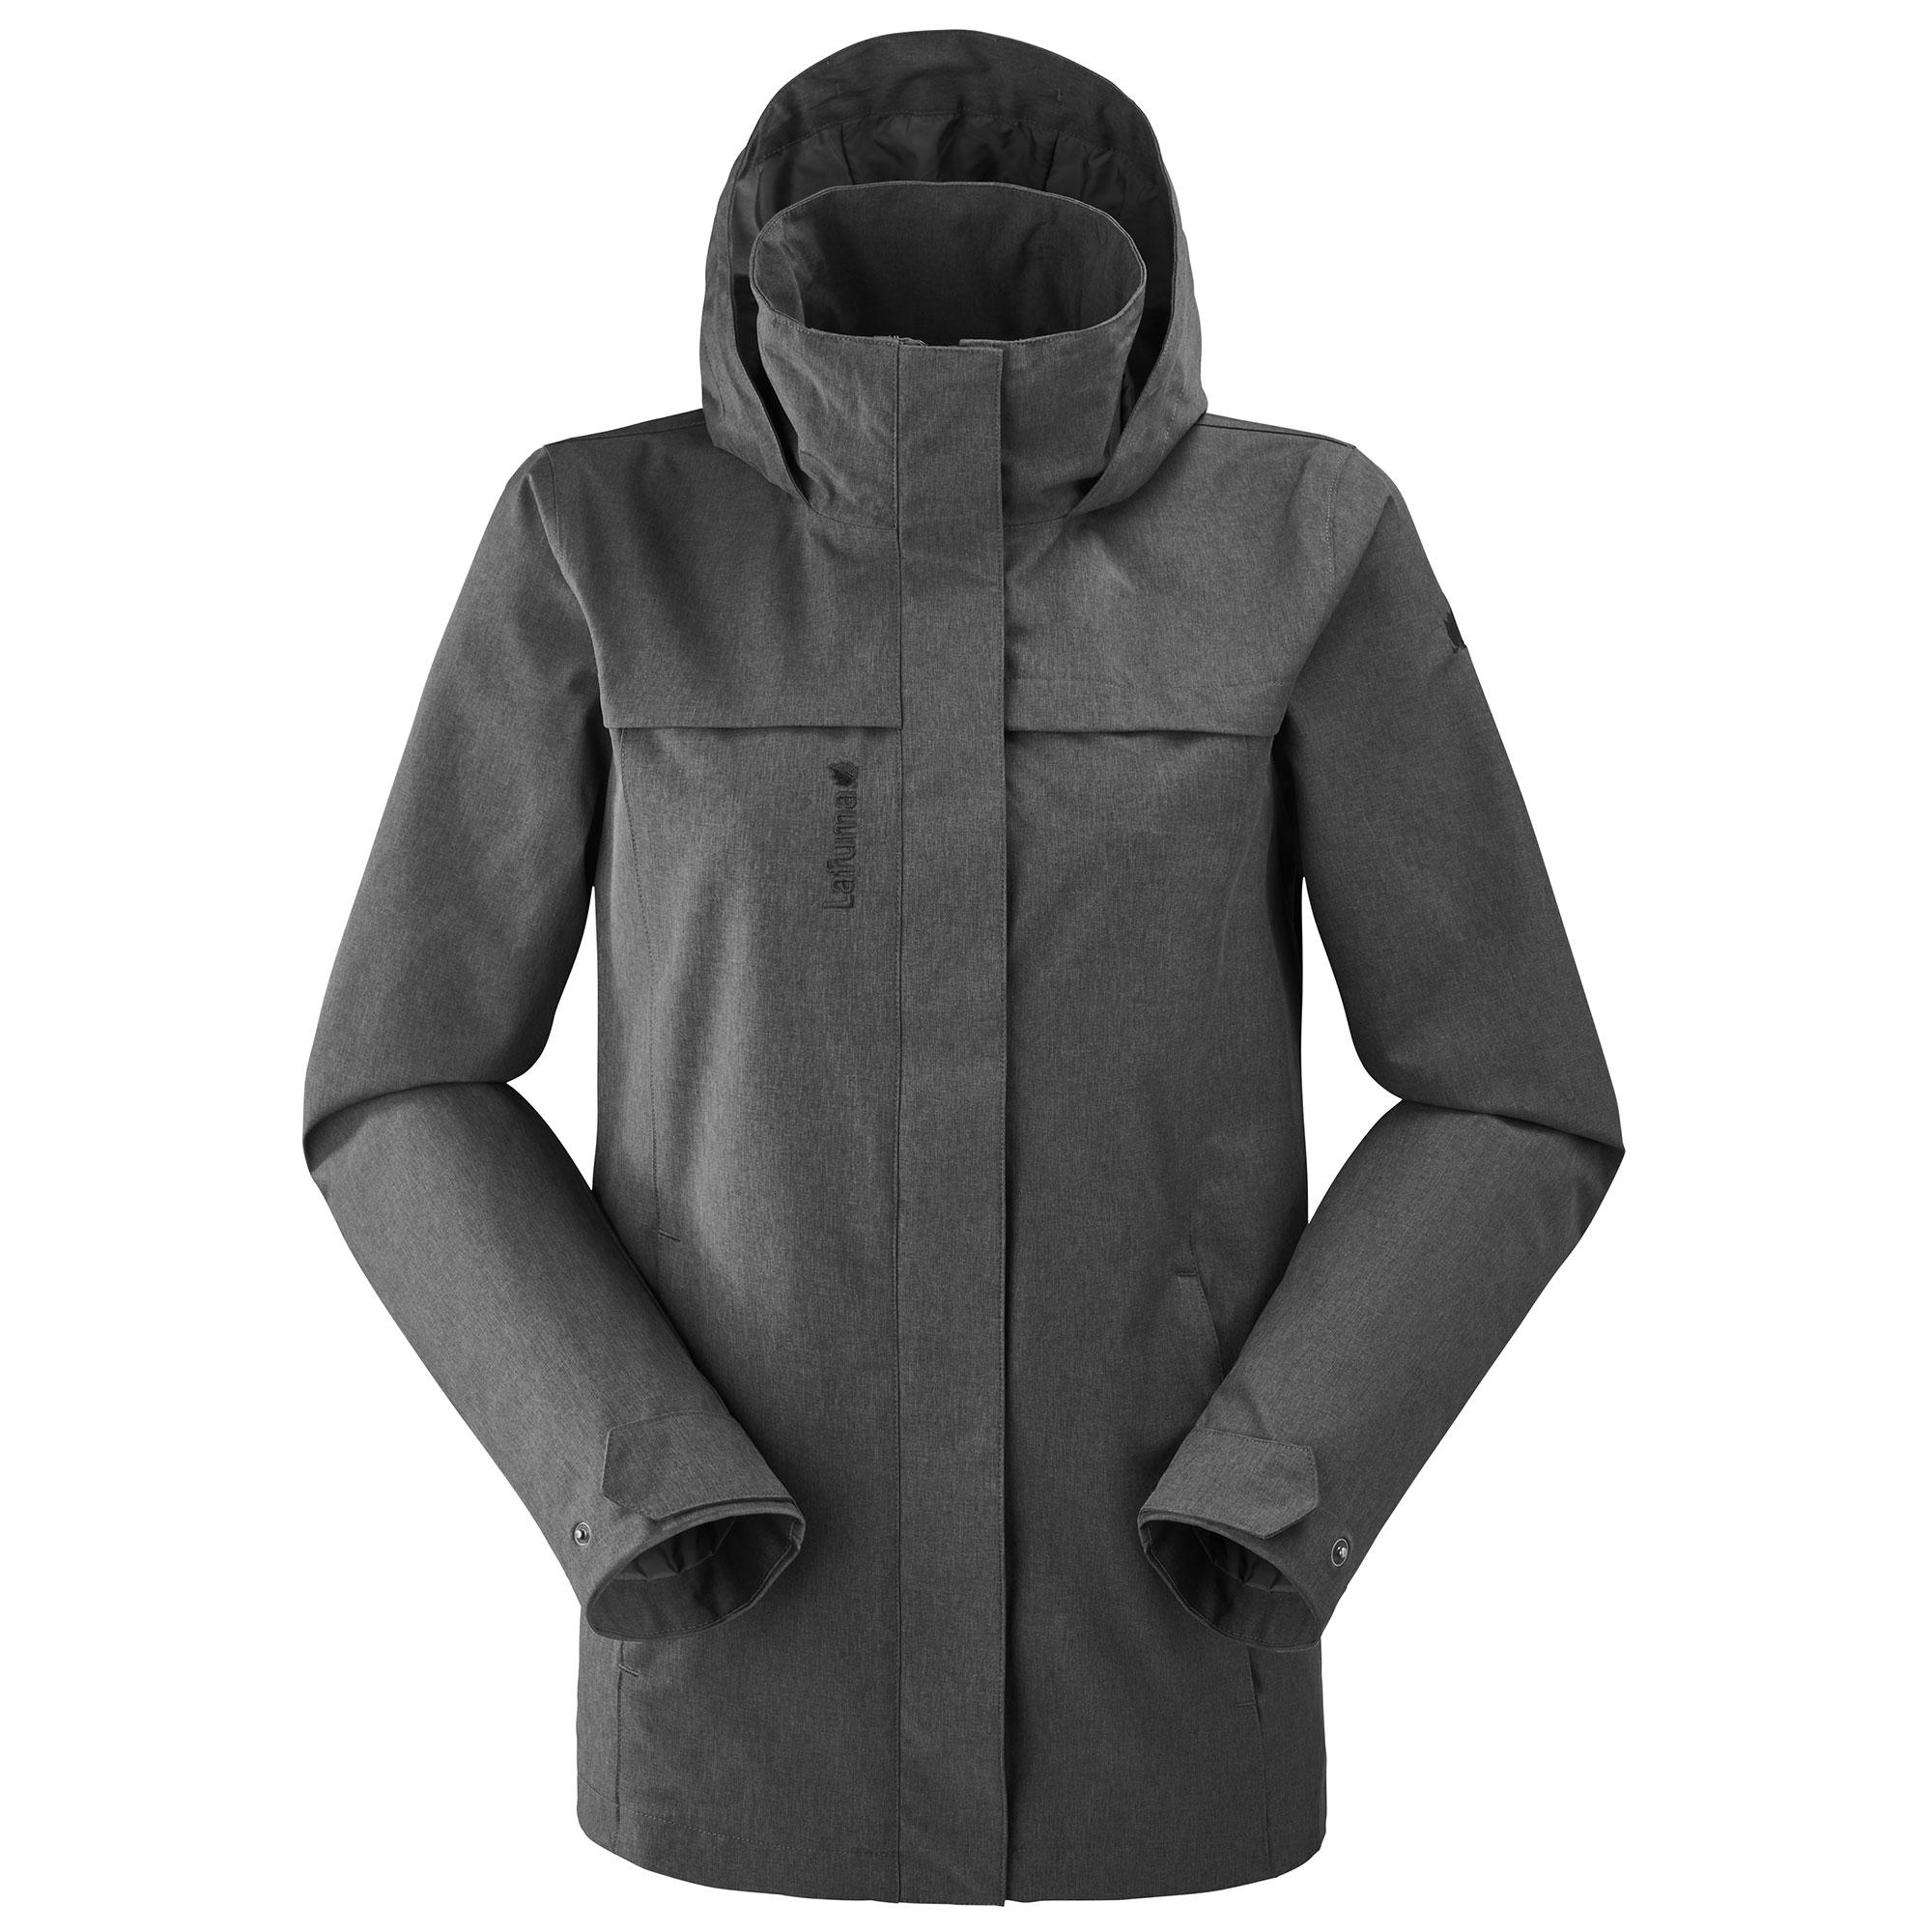 Lafuma Ld Traveller Zip-In Jkt - Hardshell jacket - Women's